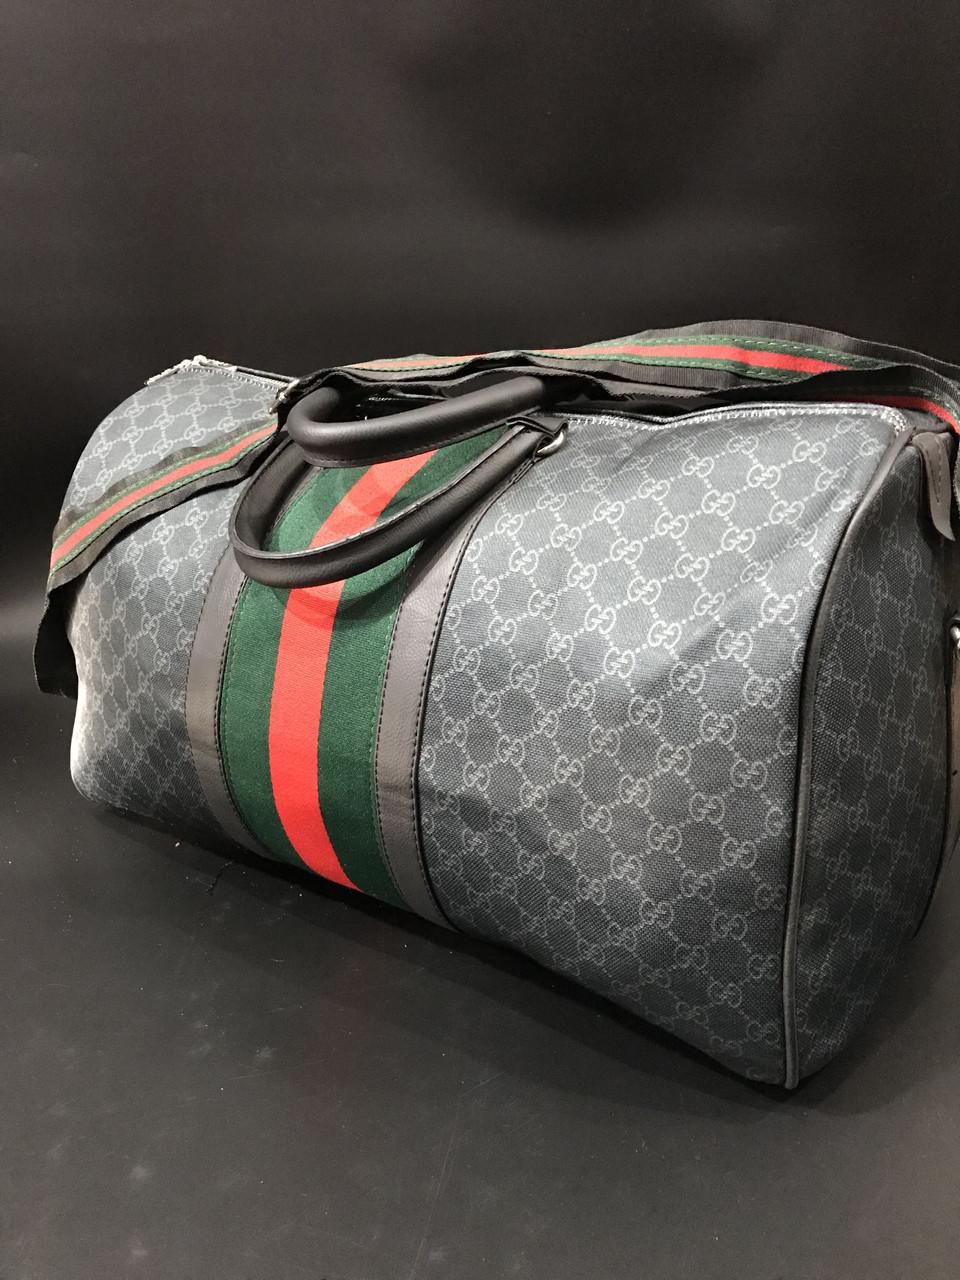 a7da614e0c8e Сумка дорожная ручная кладь саквояж спорт для путешествий Gucci копия  реплика